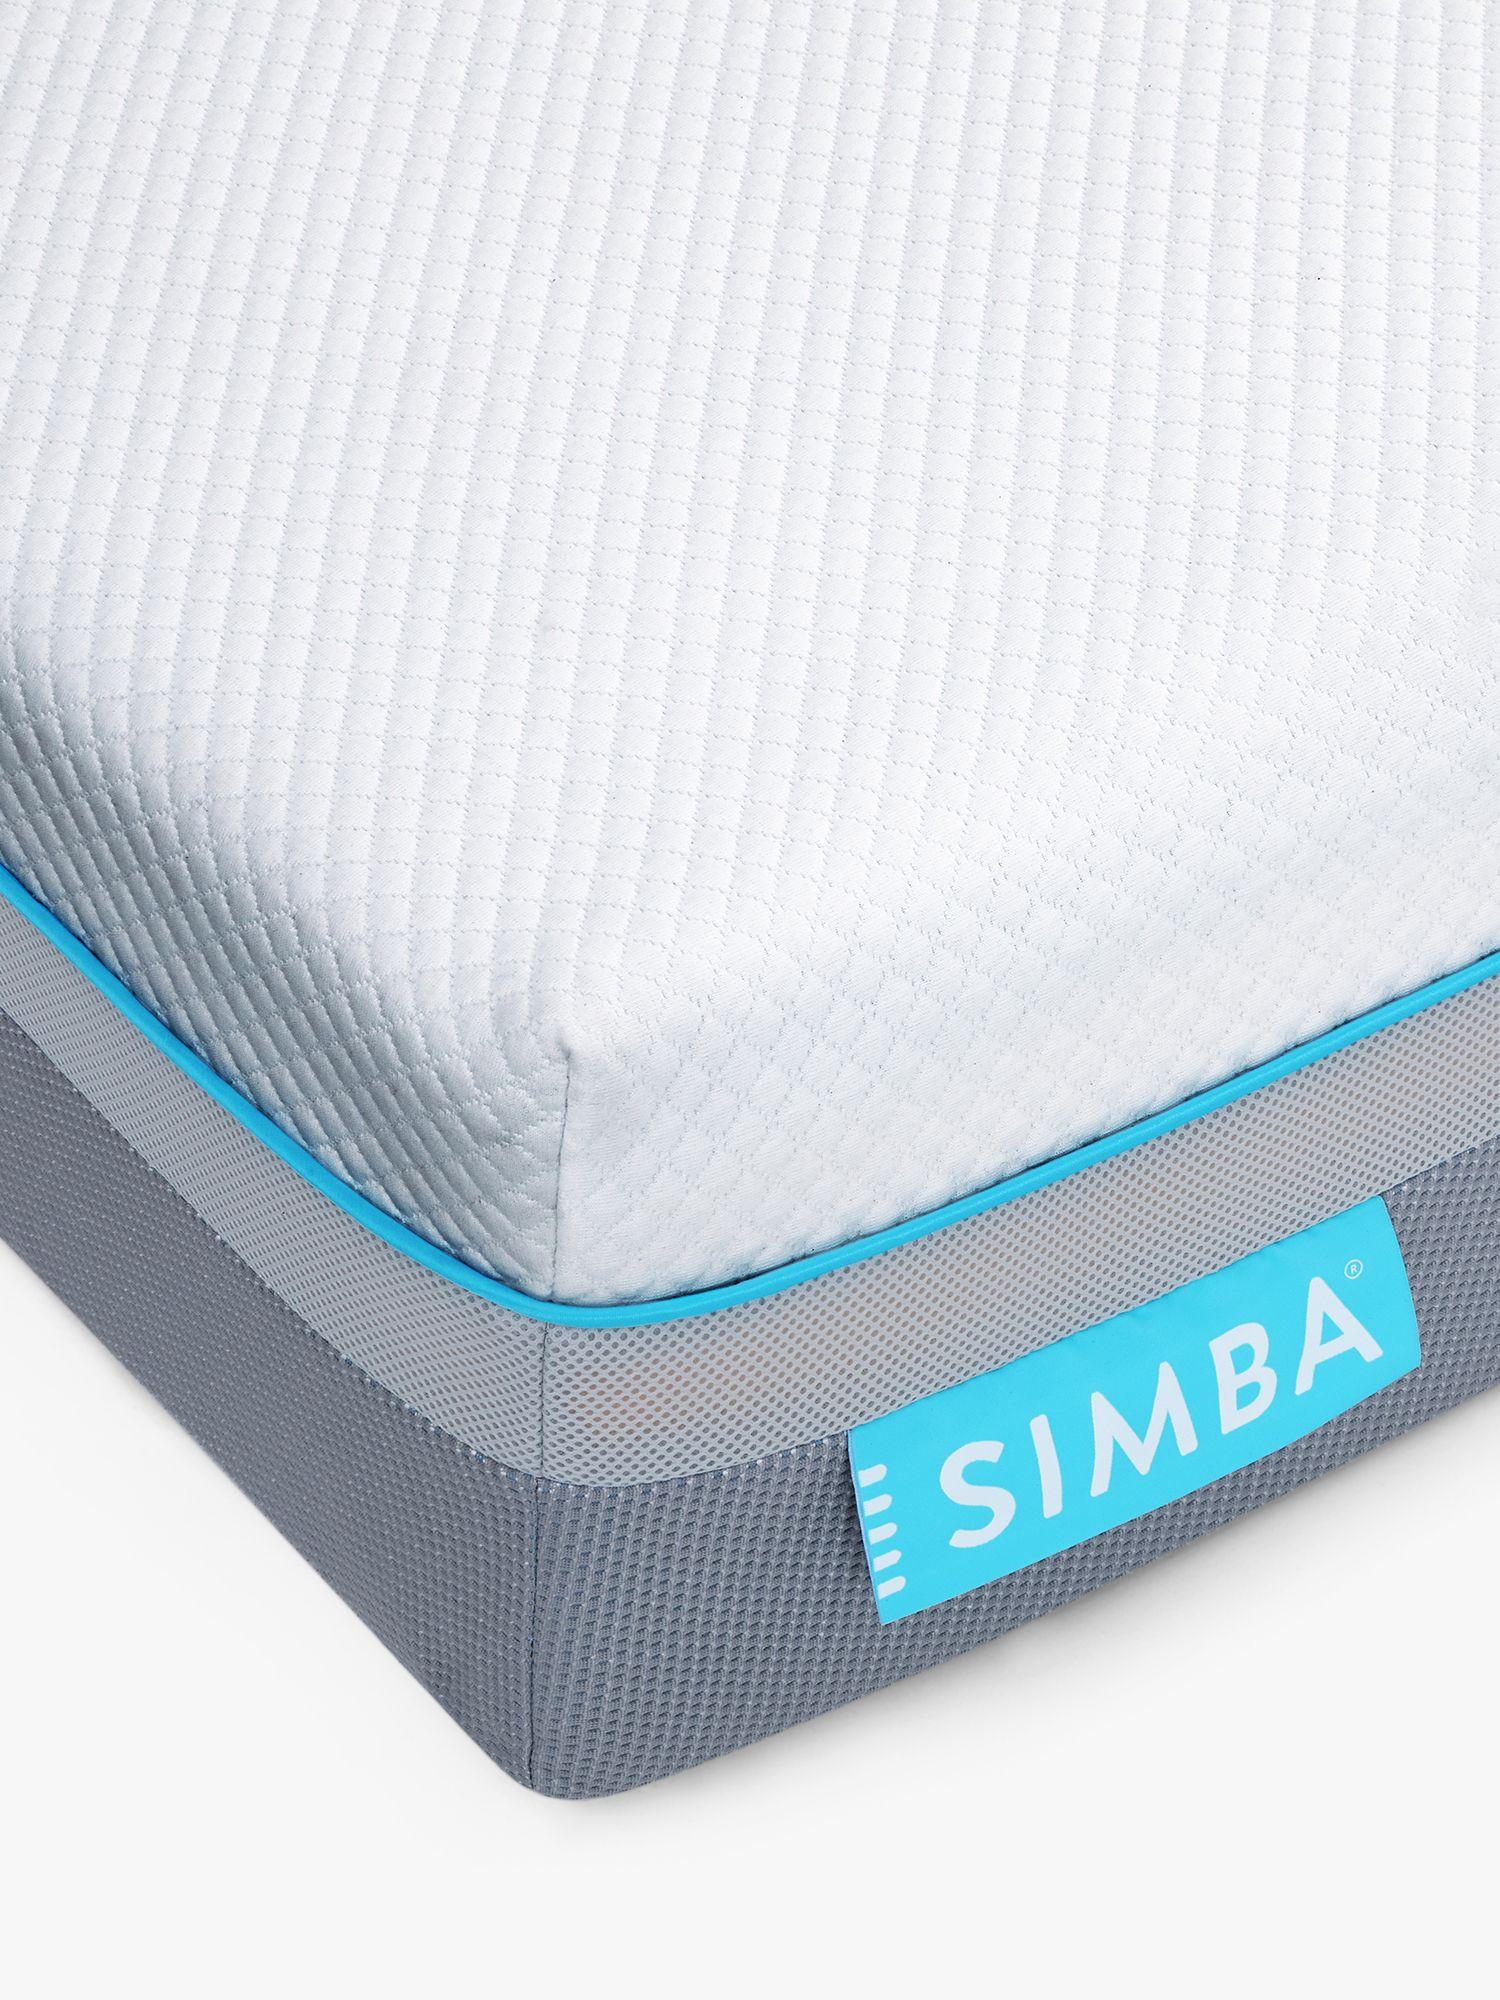 Simba Simba Hybrid® Air Cool Pocket Spring Memory Foam Mattress, Medium Tension, Single